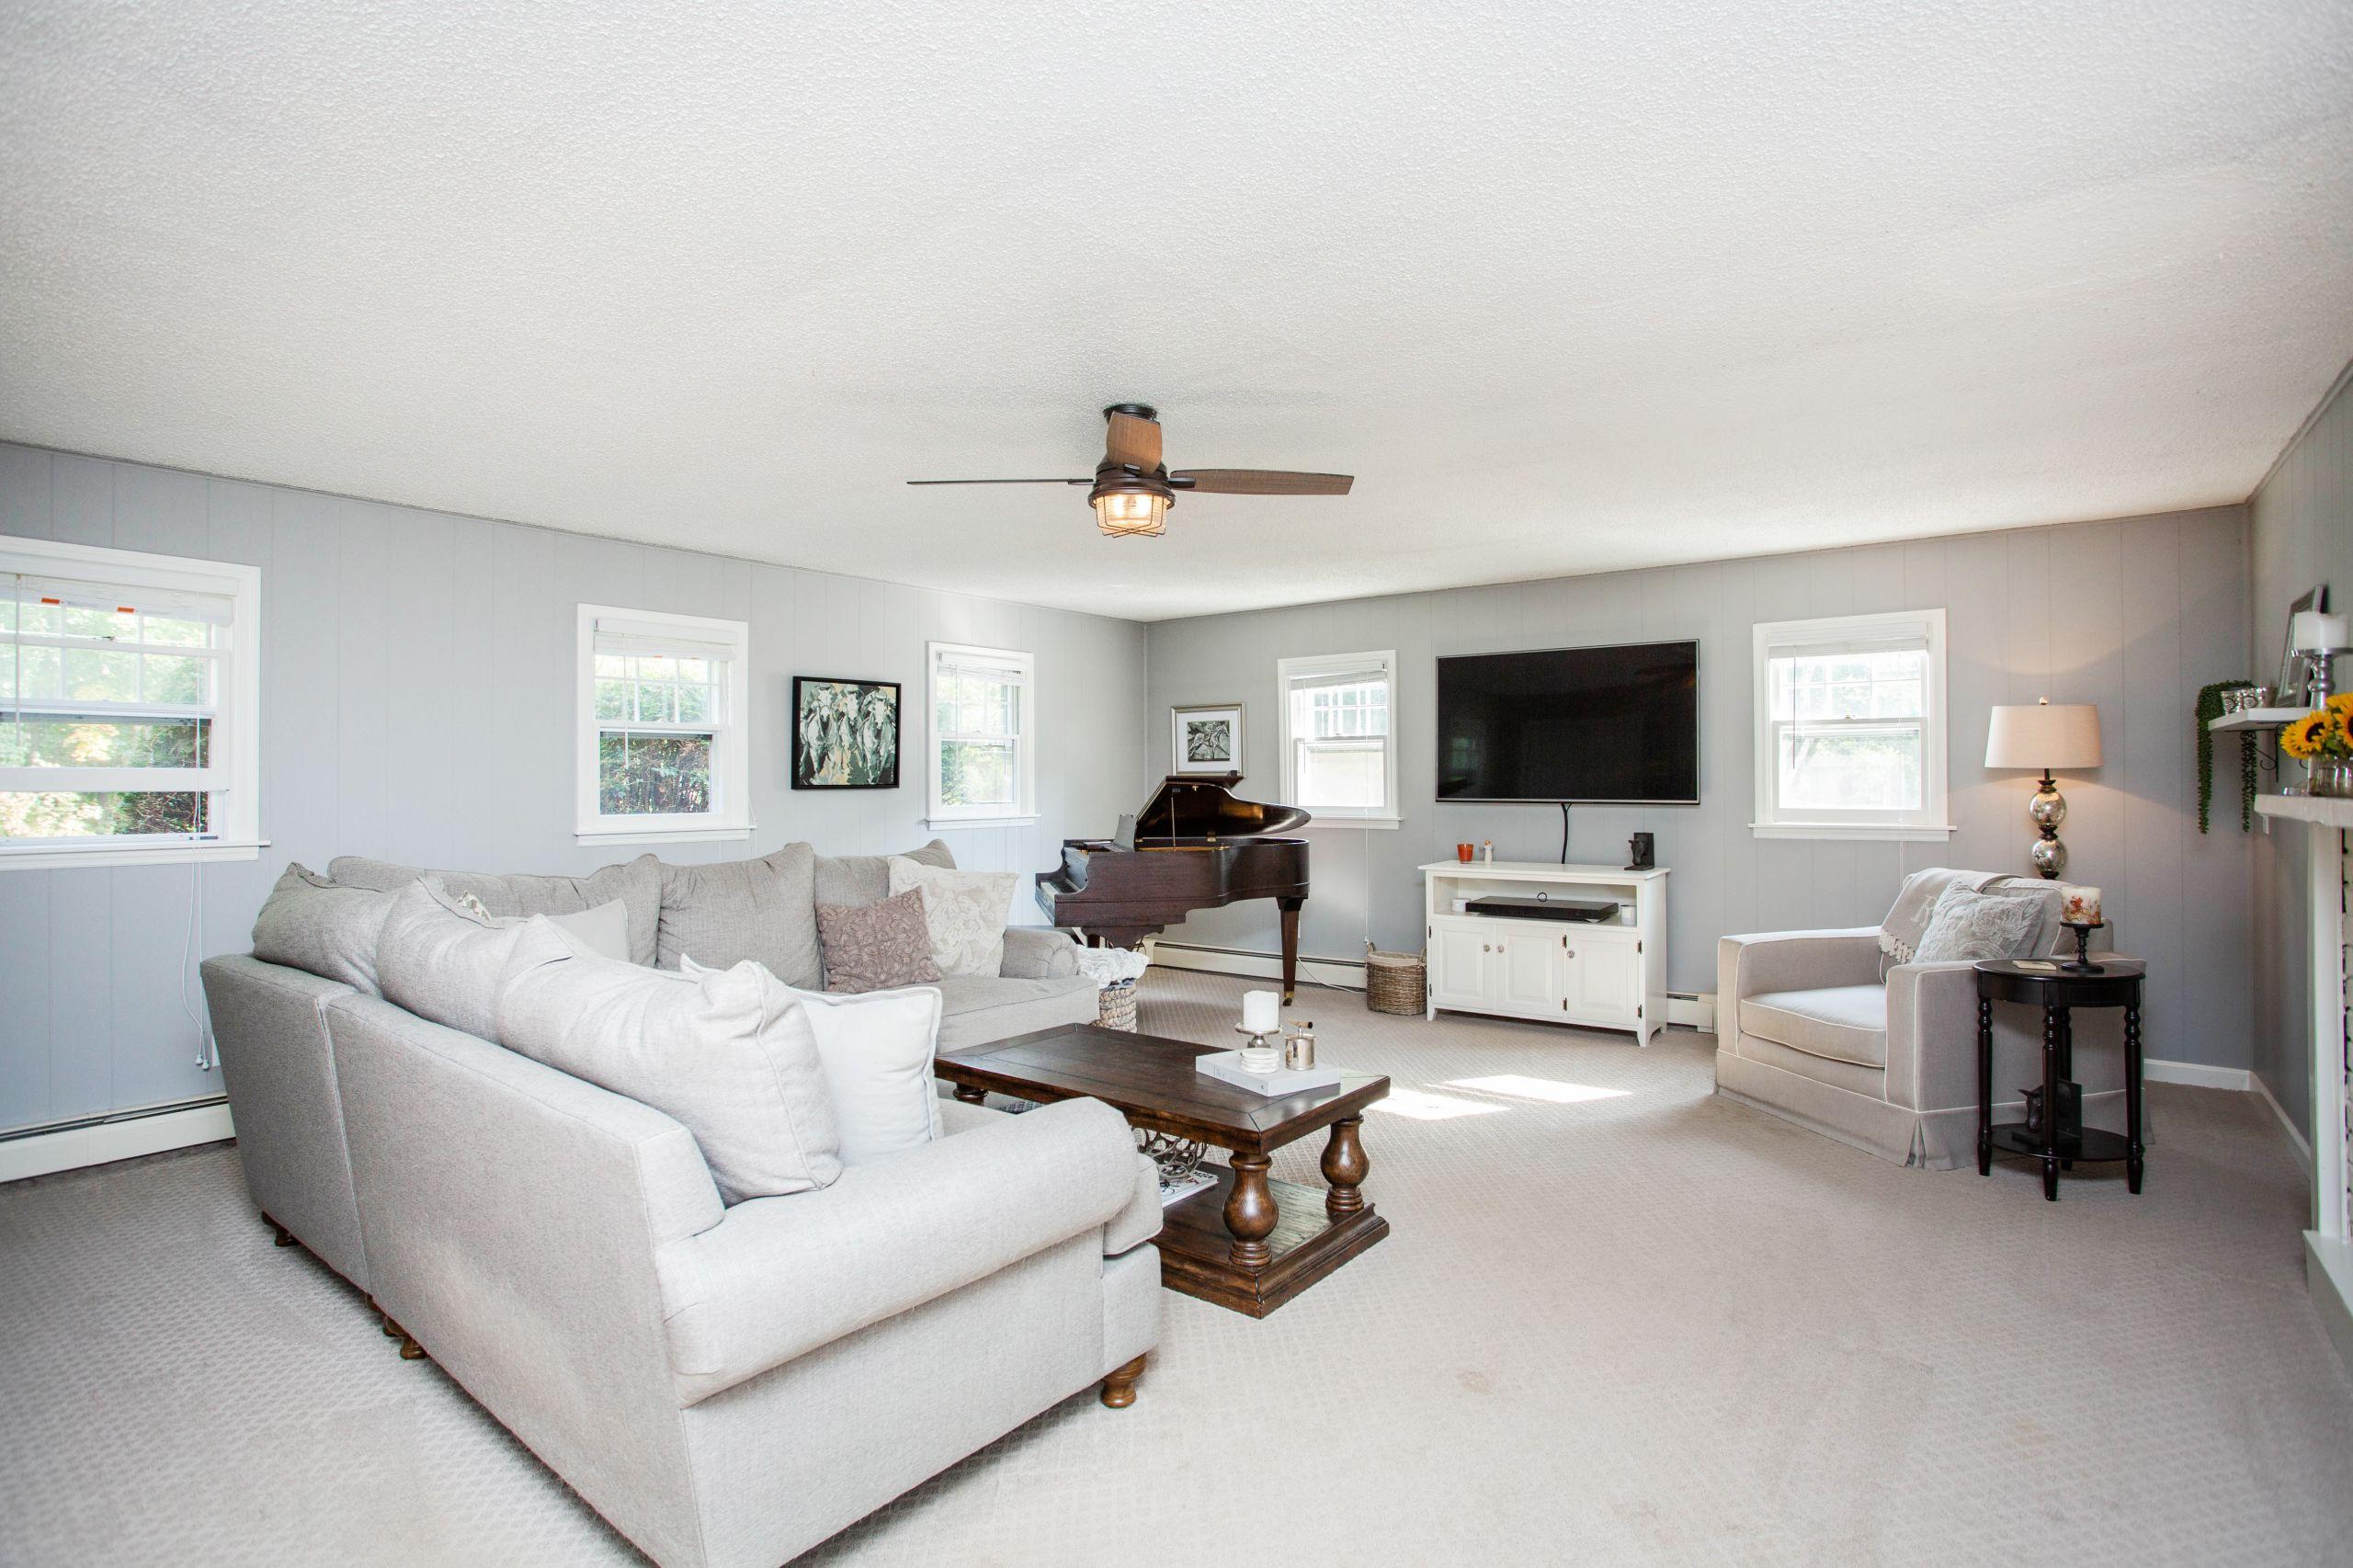 310 Daniels Rd, Saratoga Springs, New York